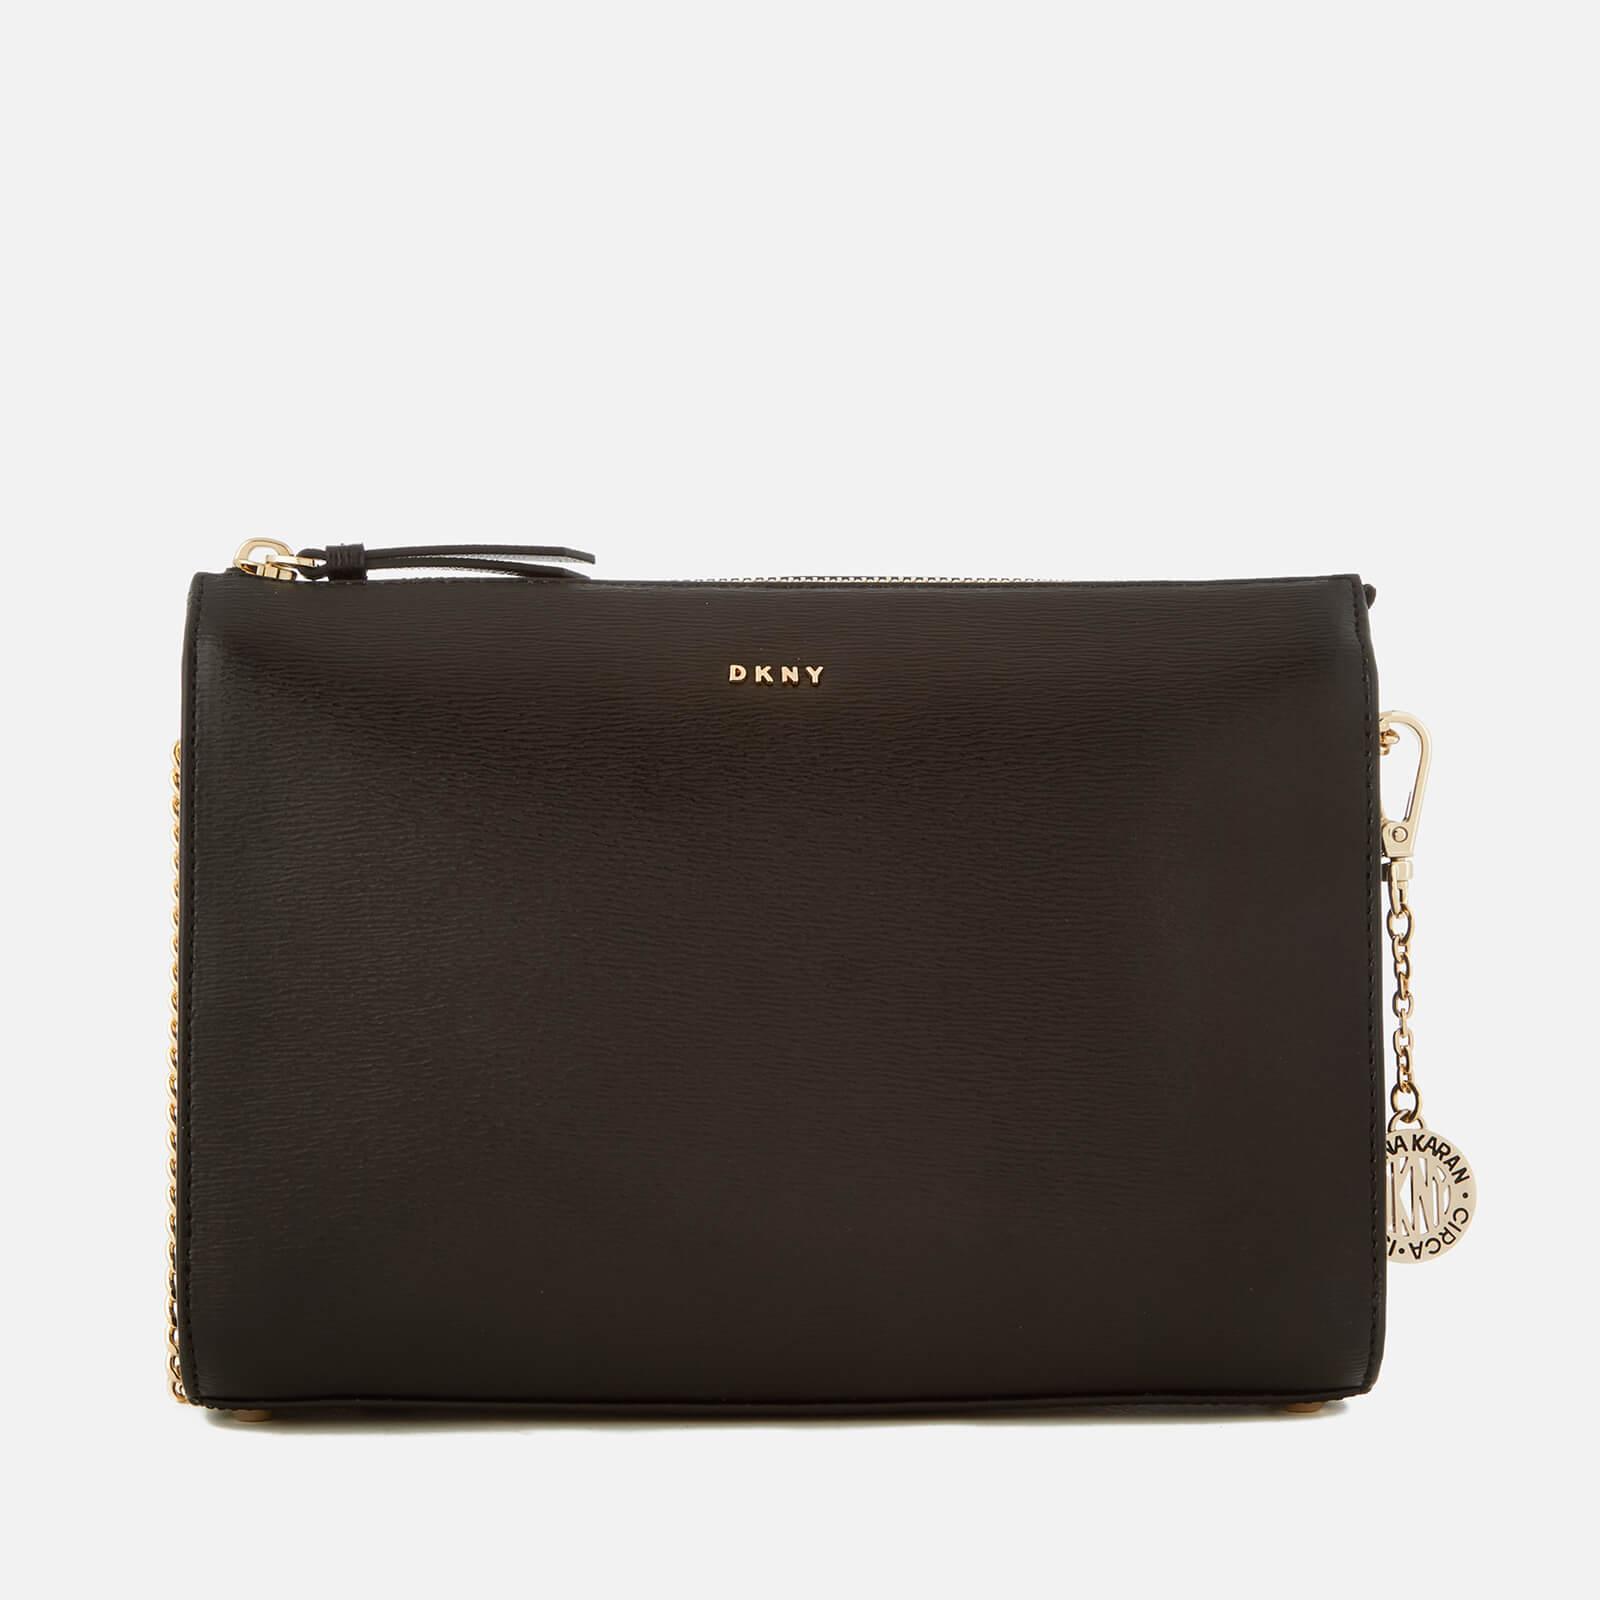 45917cb31c7 DKNY Women s Sutton Small Top Zip Cross Body Bag - Black - Free UK ...